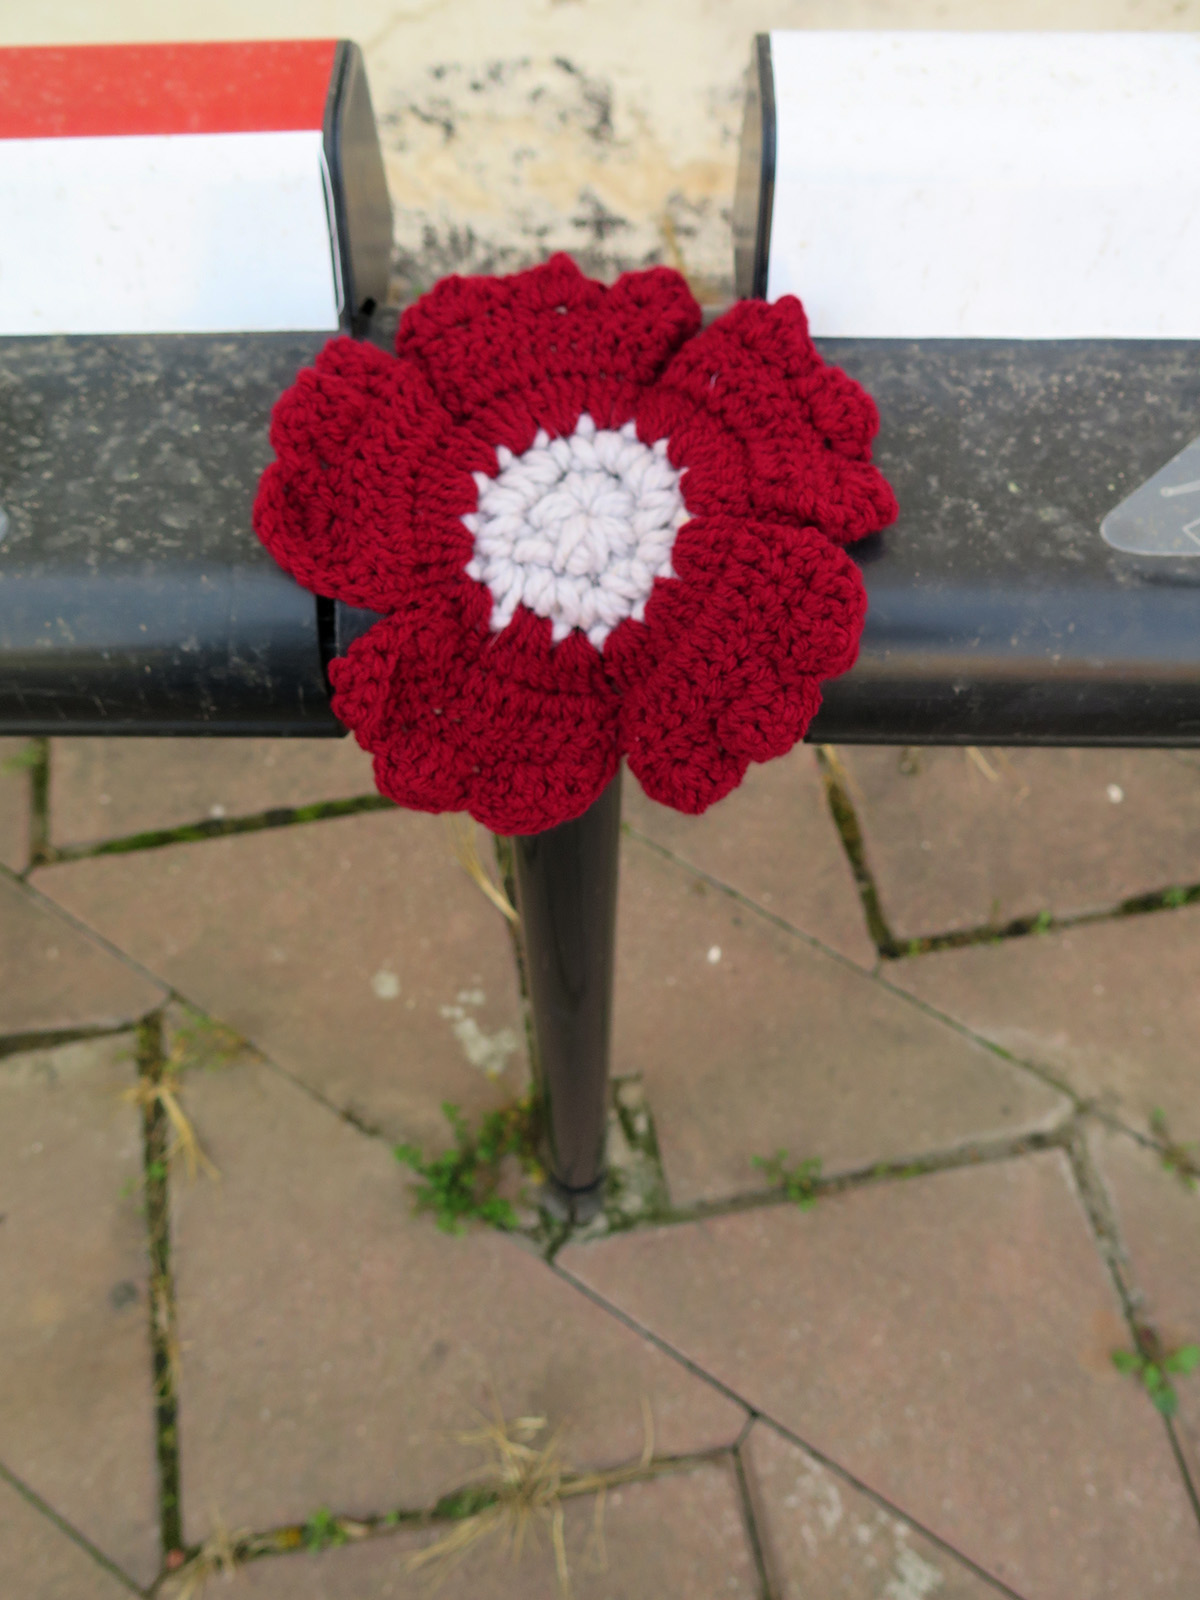 72_trikoarte_Street Flowers Barna 23 feb dist 8  IMG (74).jpg